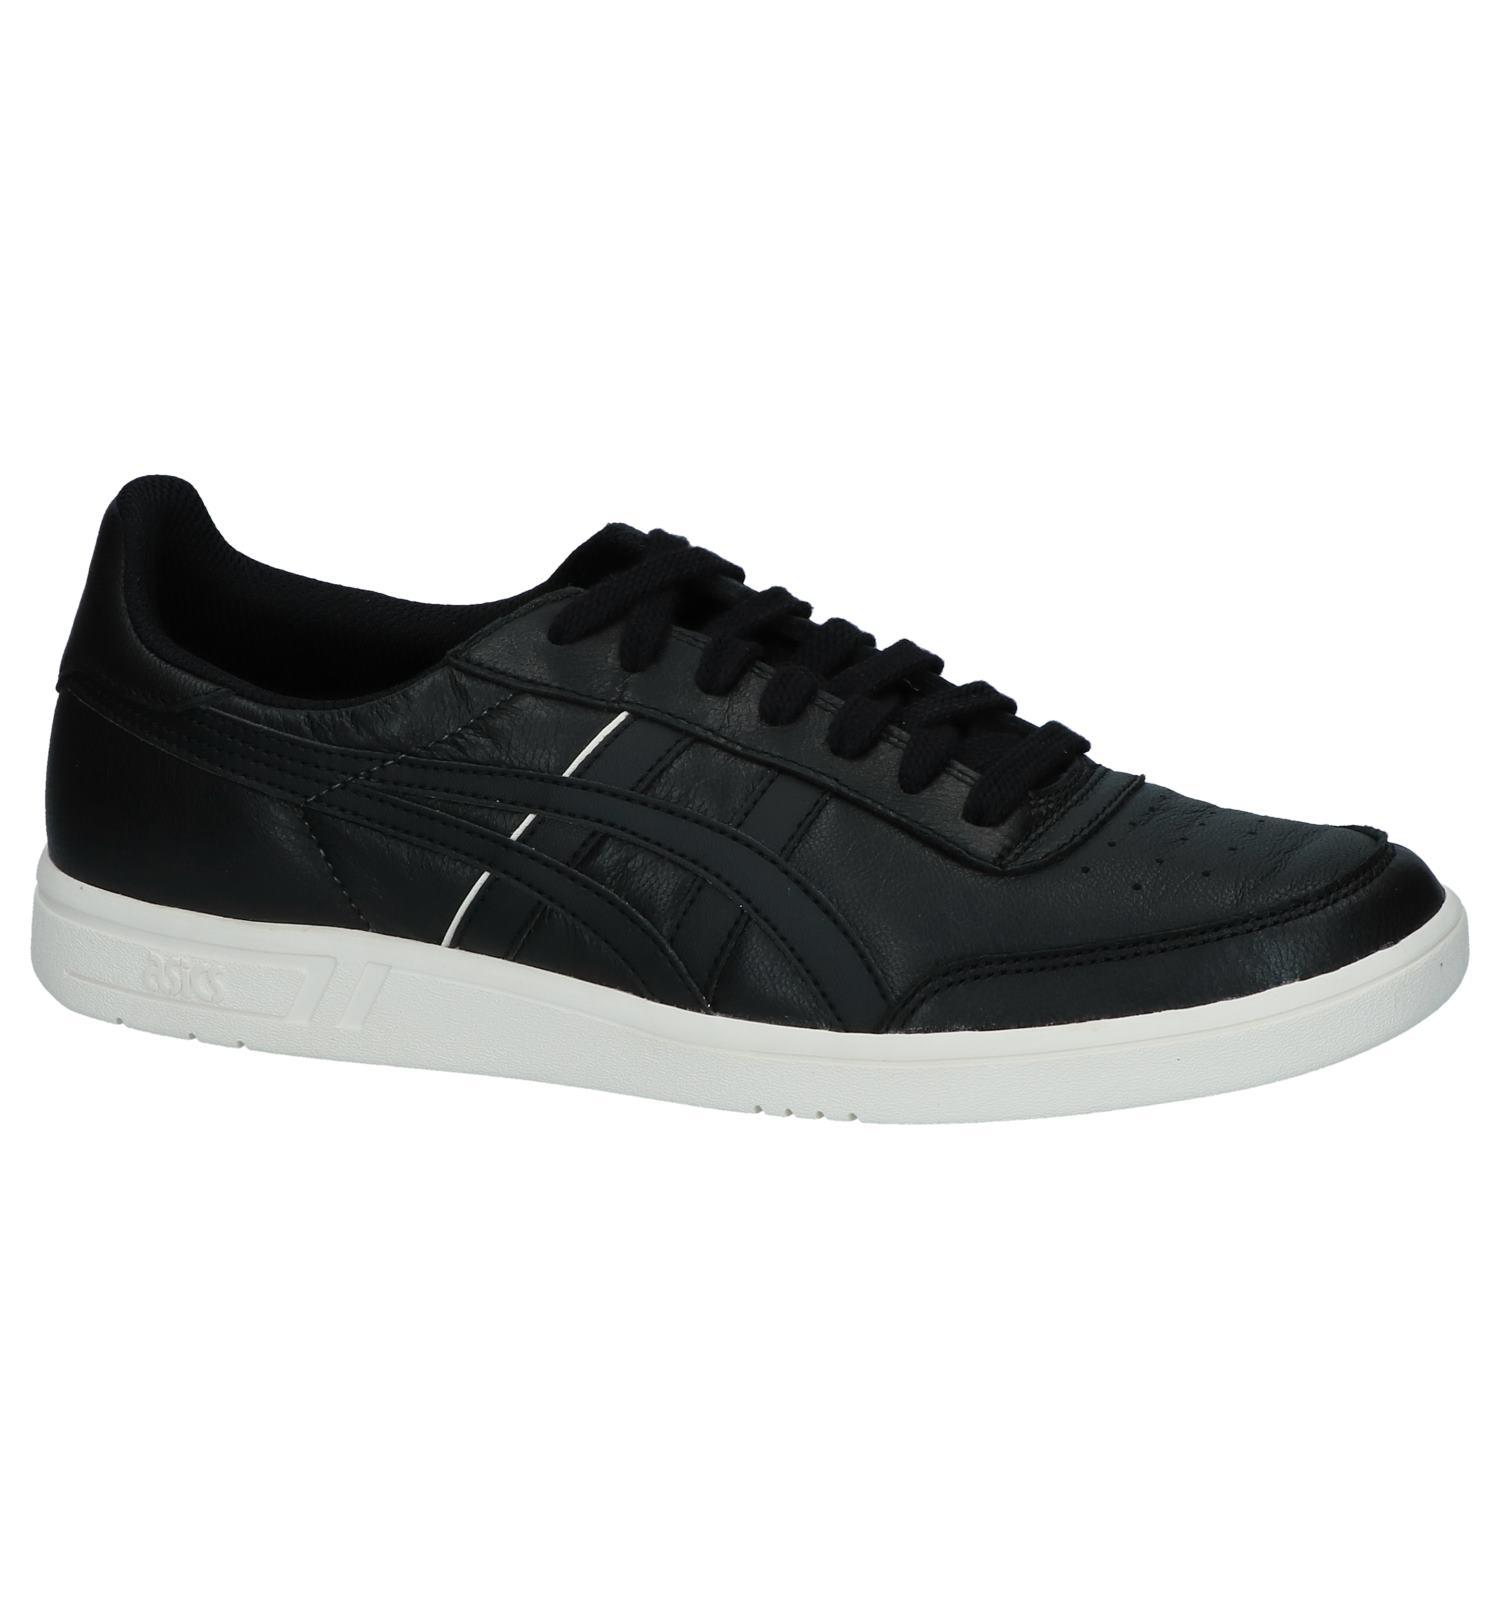 zwarte asics sneakers